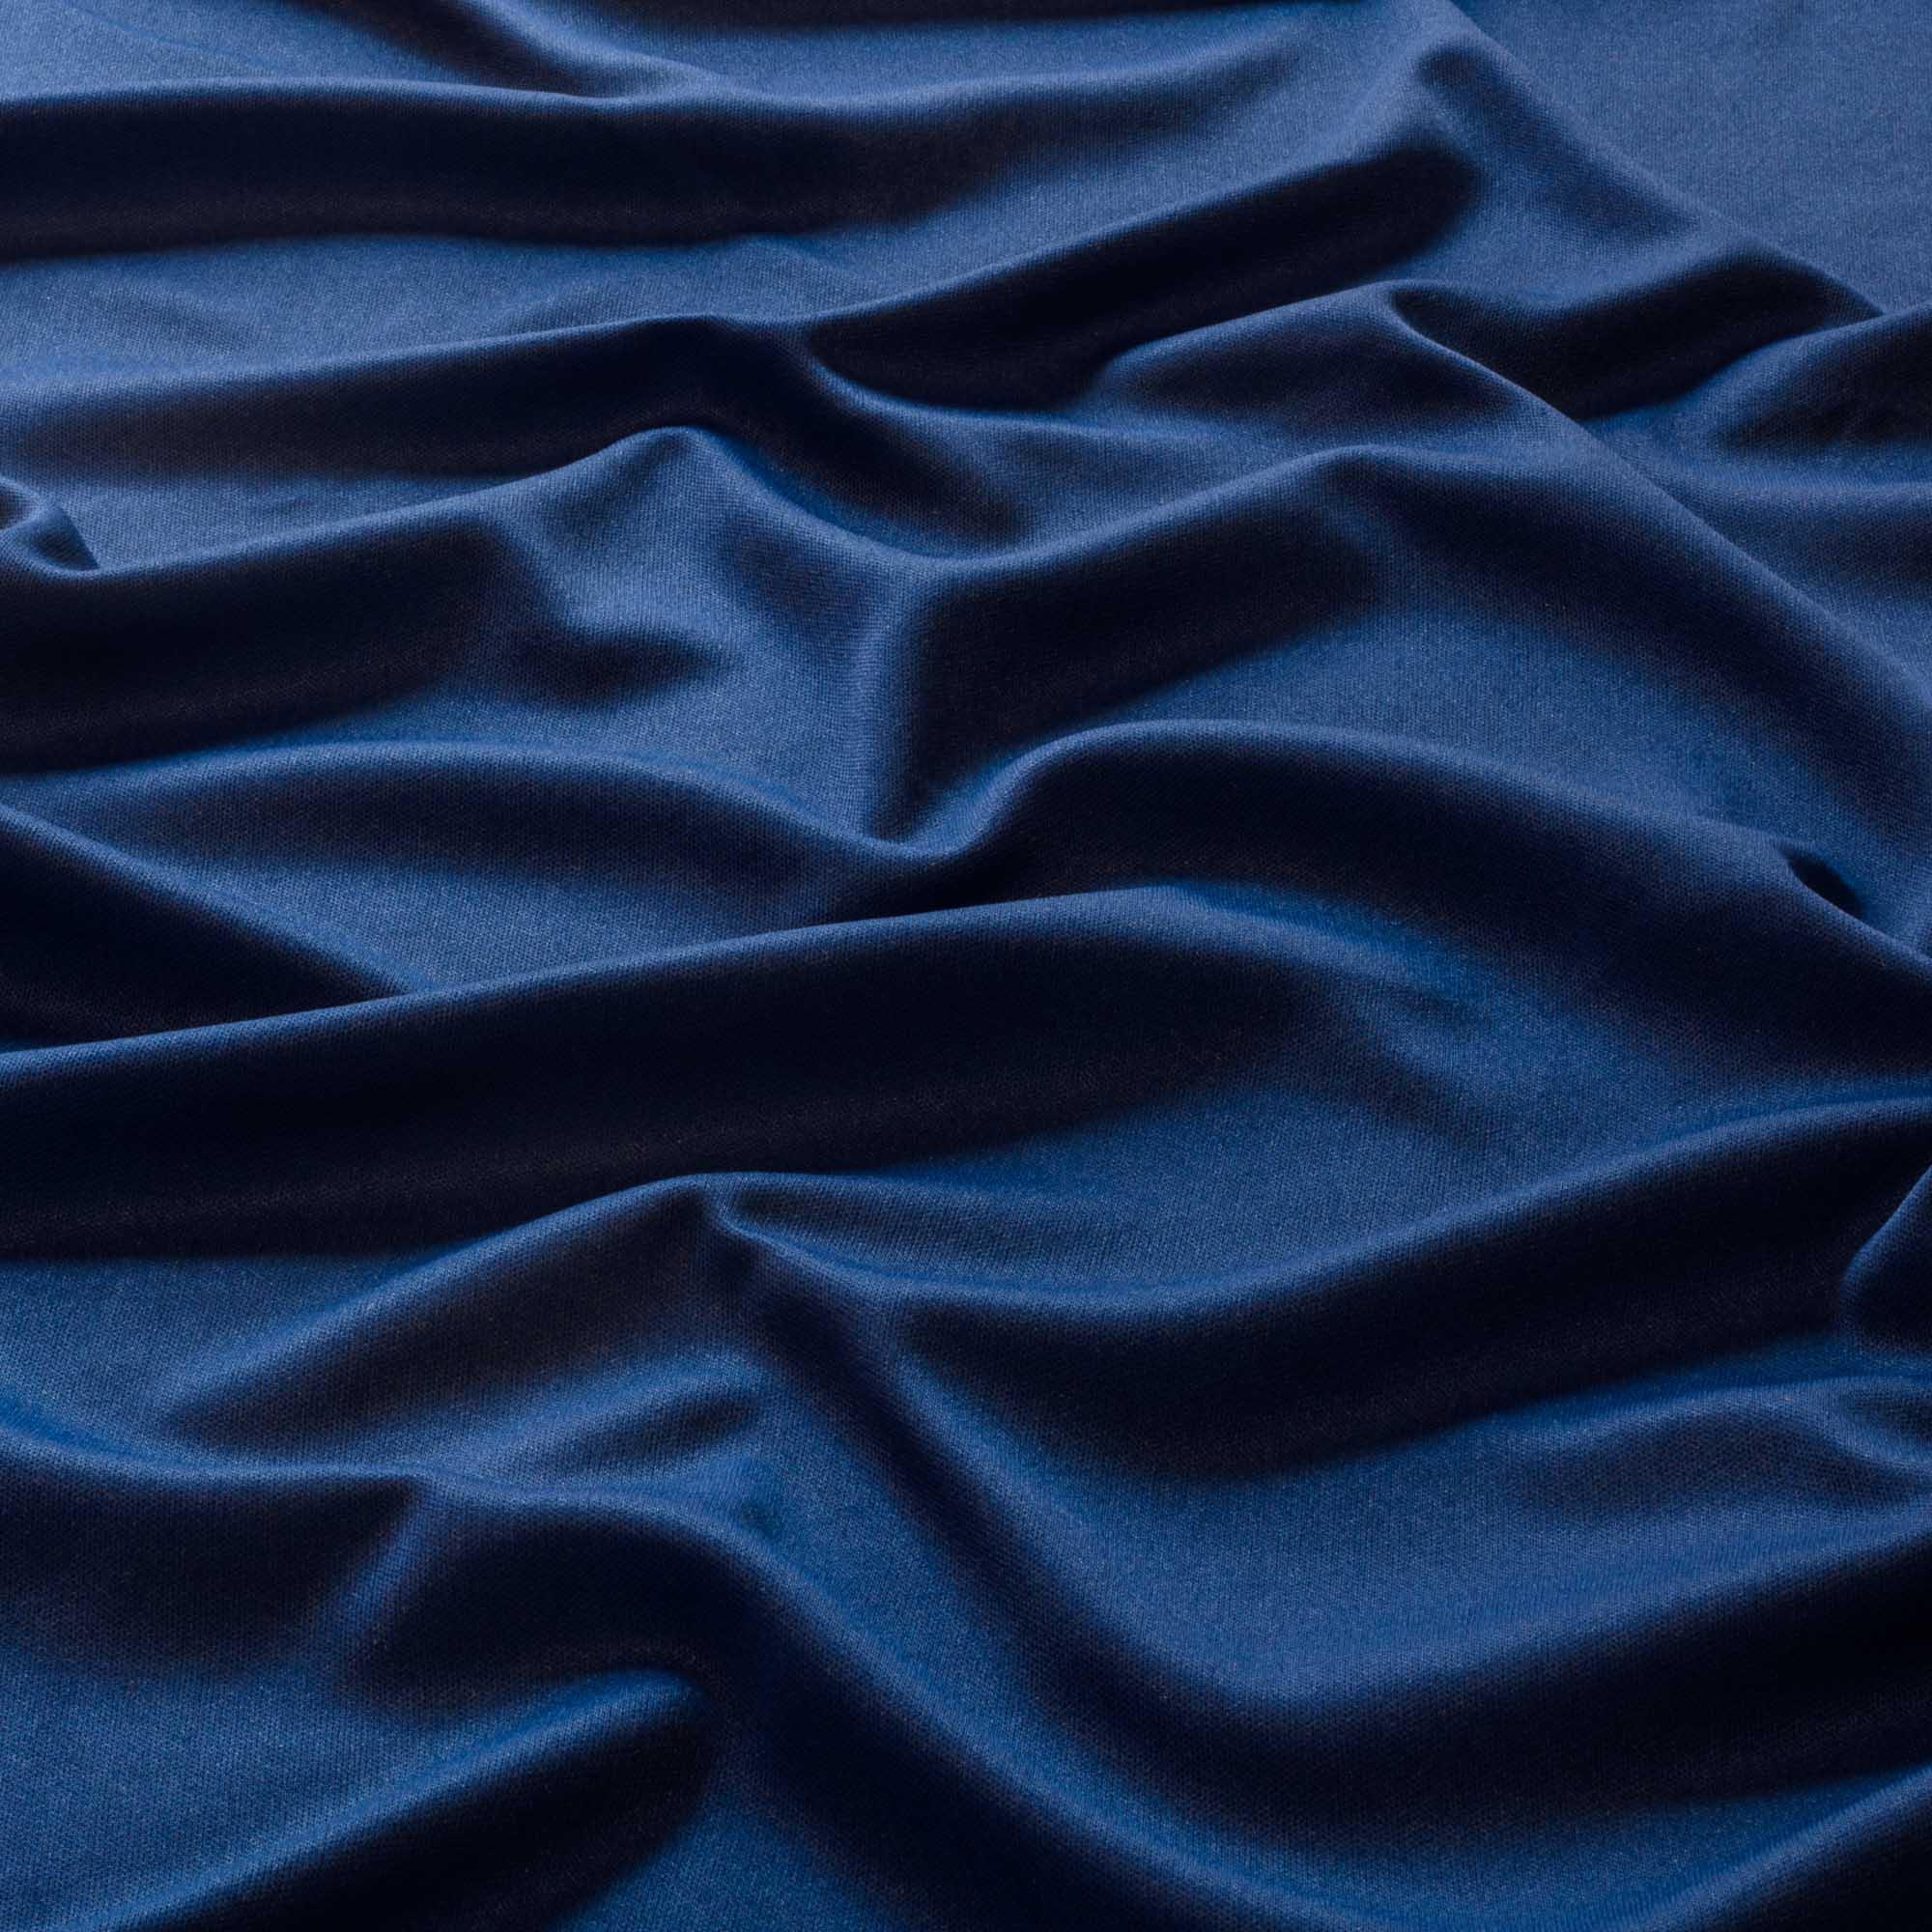 Tecido Malha Helanca Light Azul Royal 100% Poliester 1,80 mt Largura